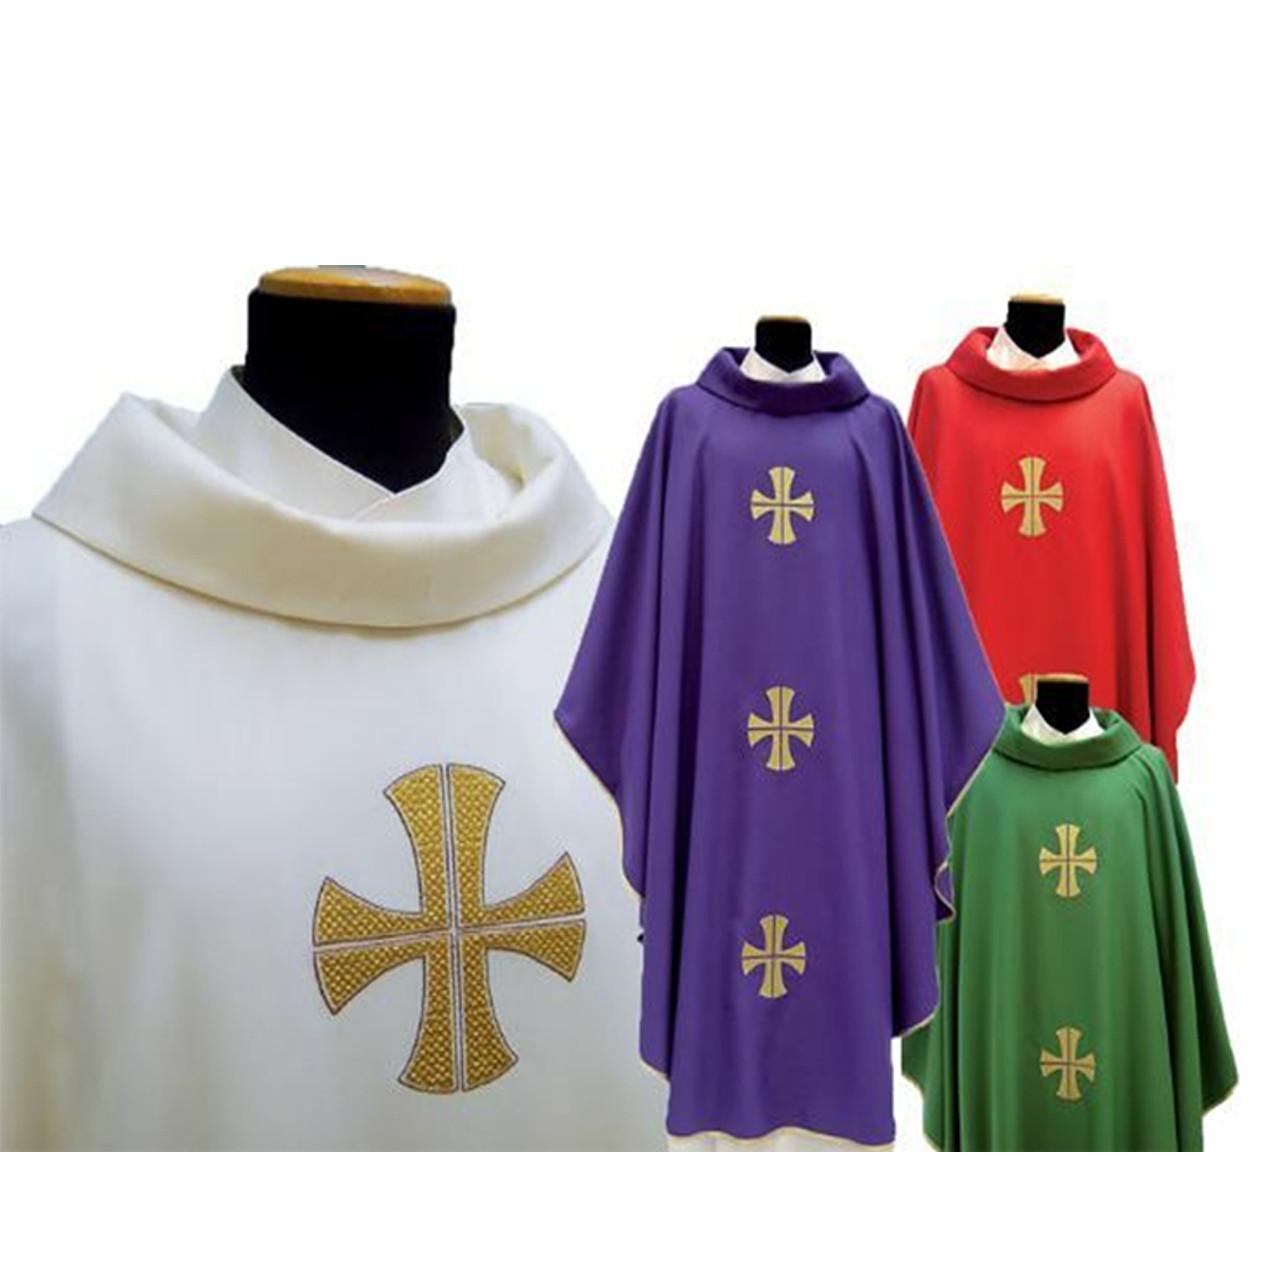 318 Chasuble in Monastico Fabric